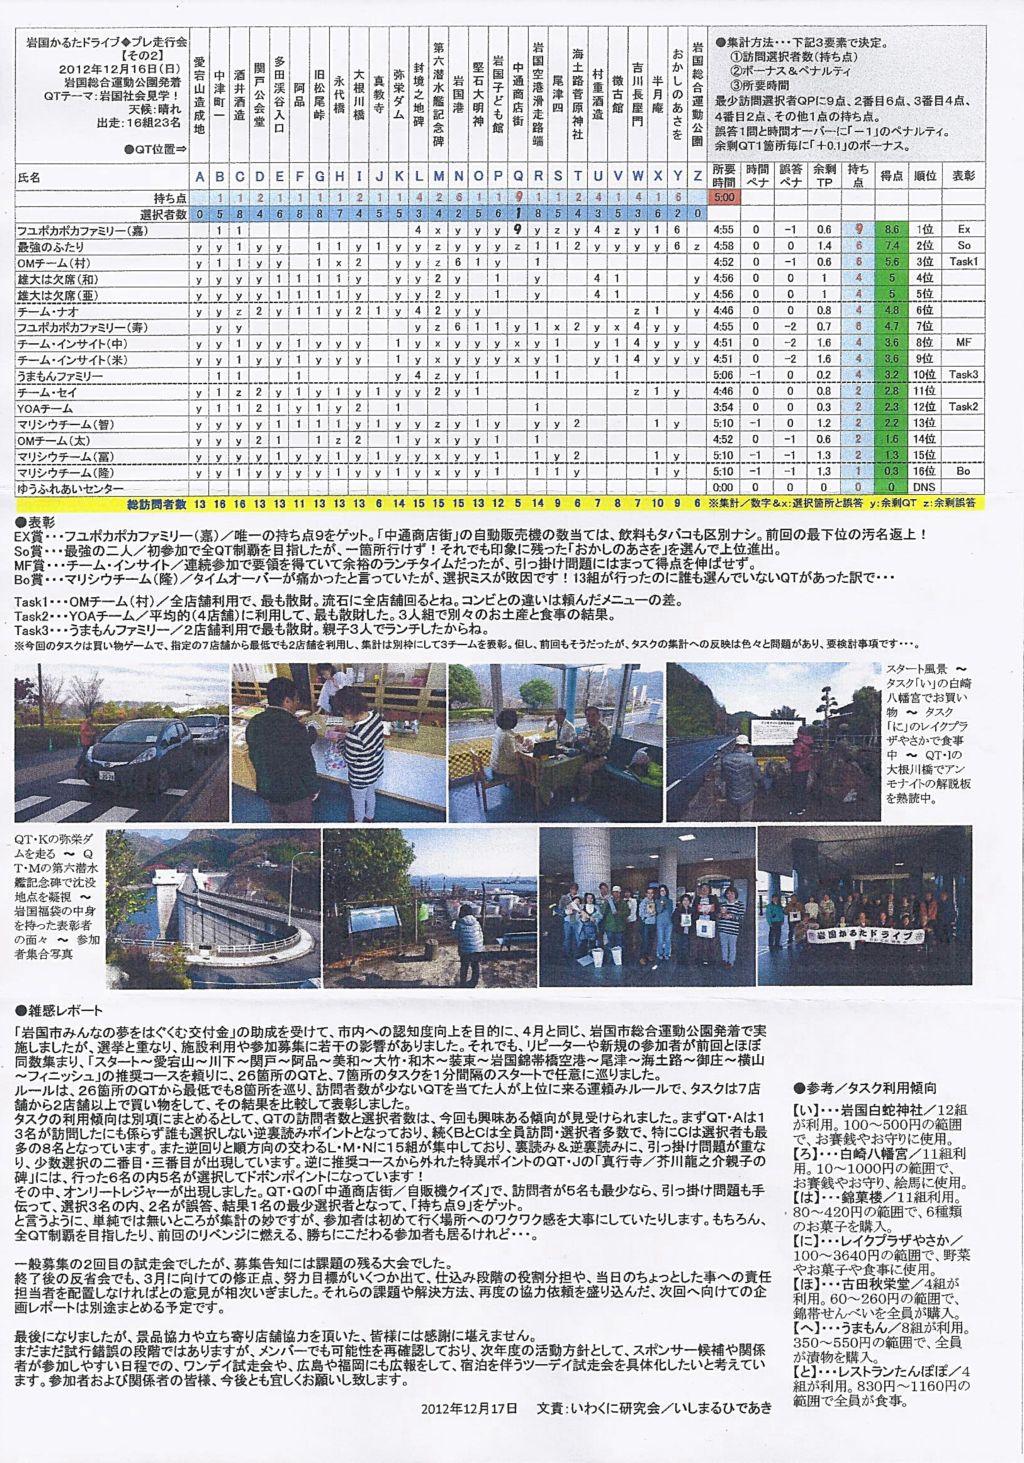 Scan_20130125_13_R.jpg